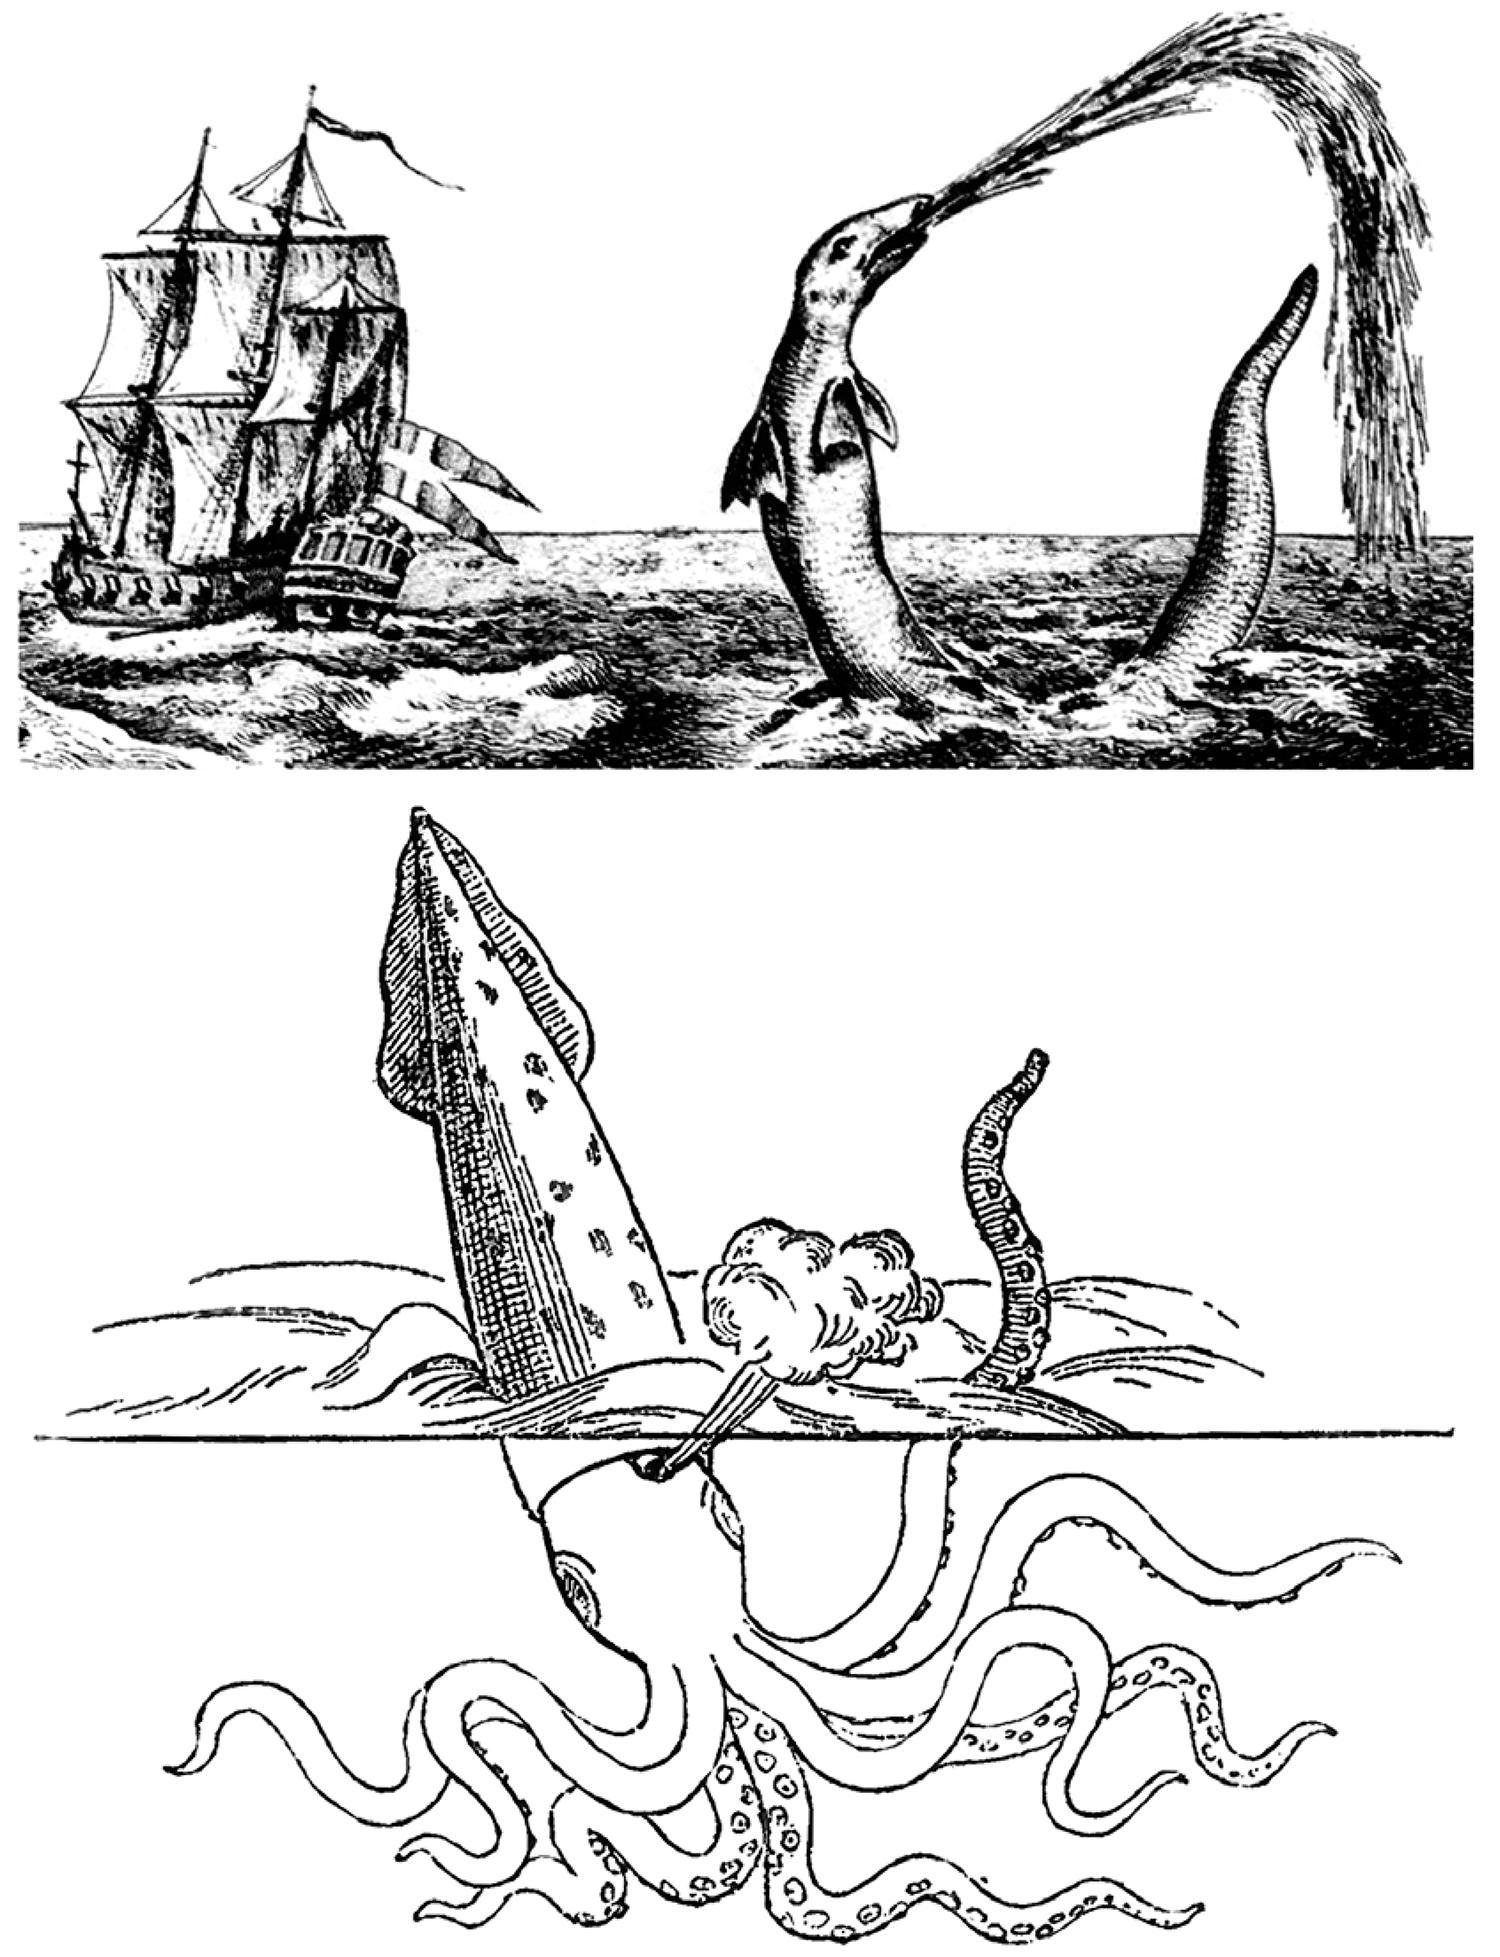 1500x1957 The Kraken when myth encounters science